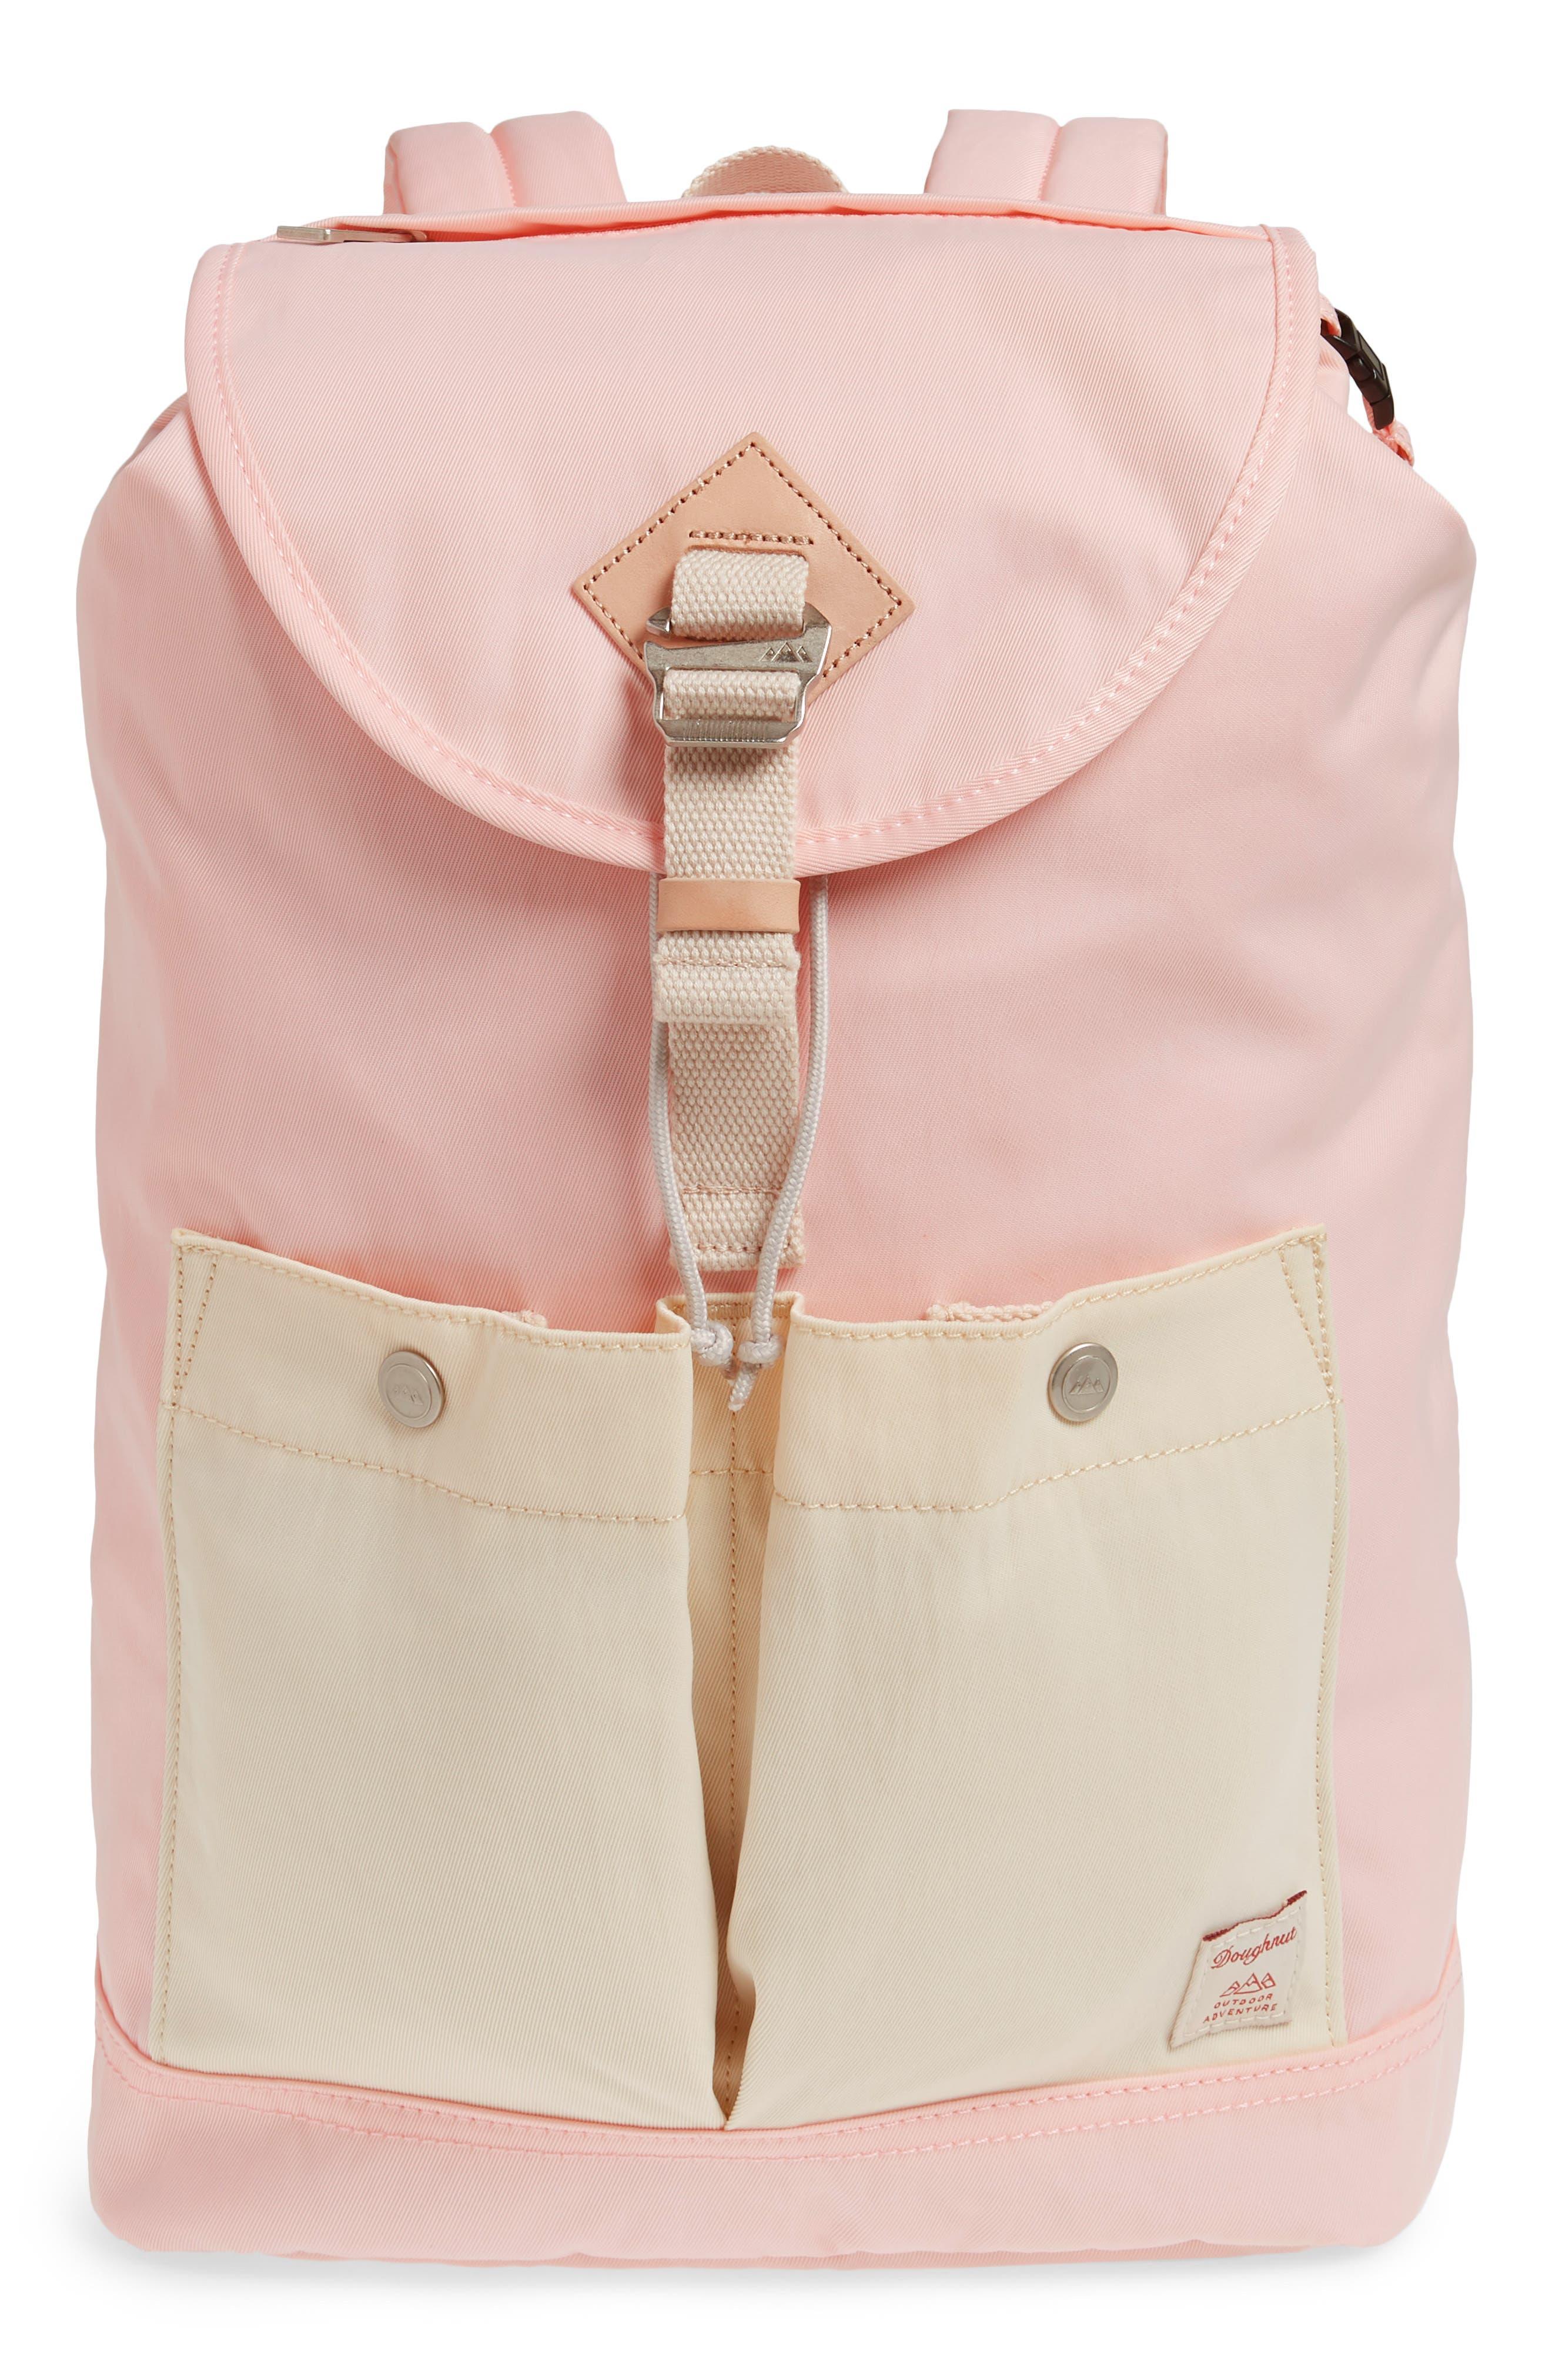 DOUGHNUT Montana Water Repellent Backpack - Pink in Sakura/ Cream